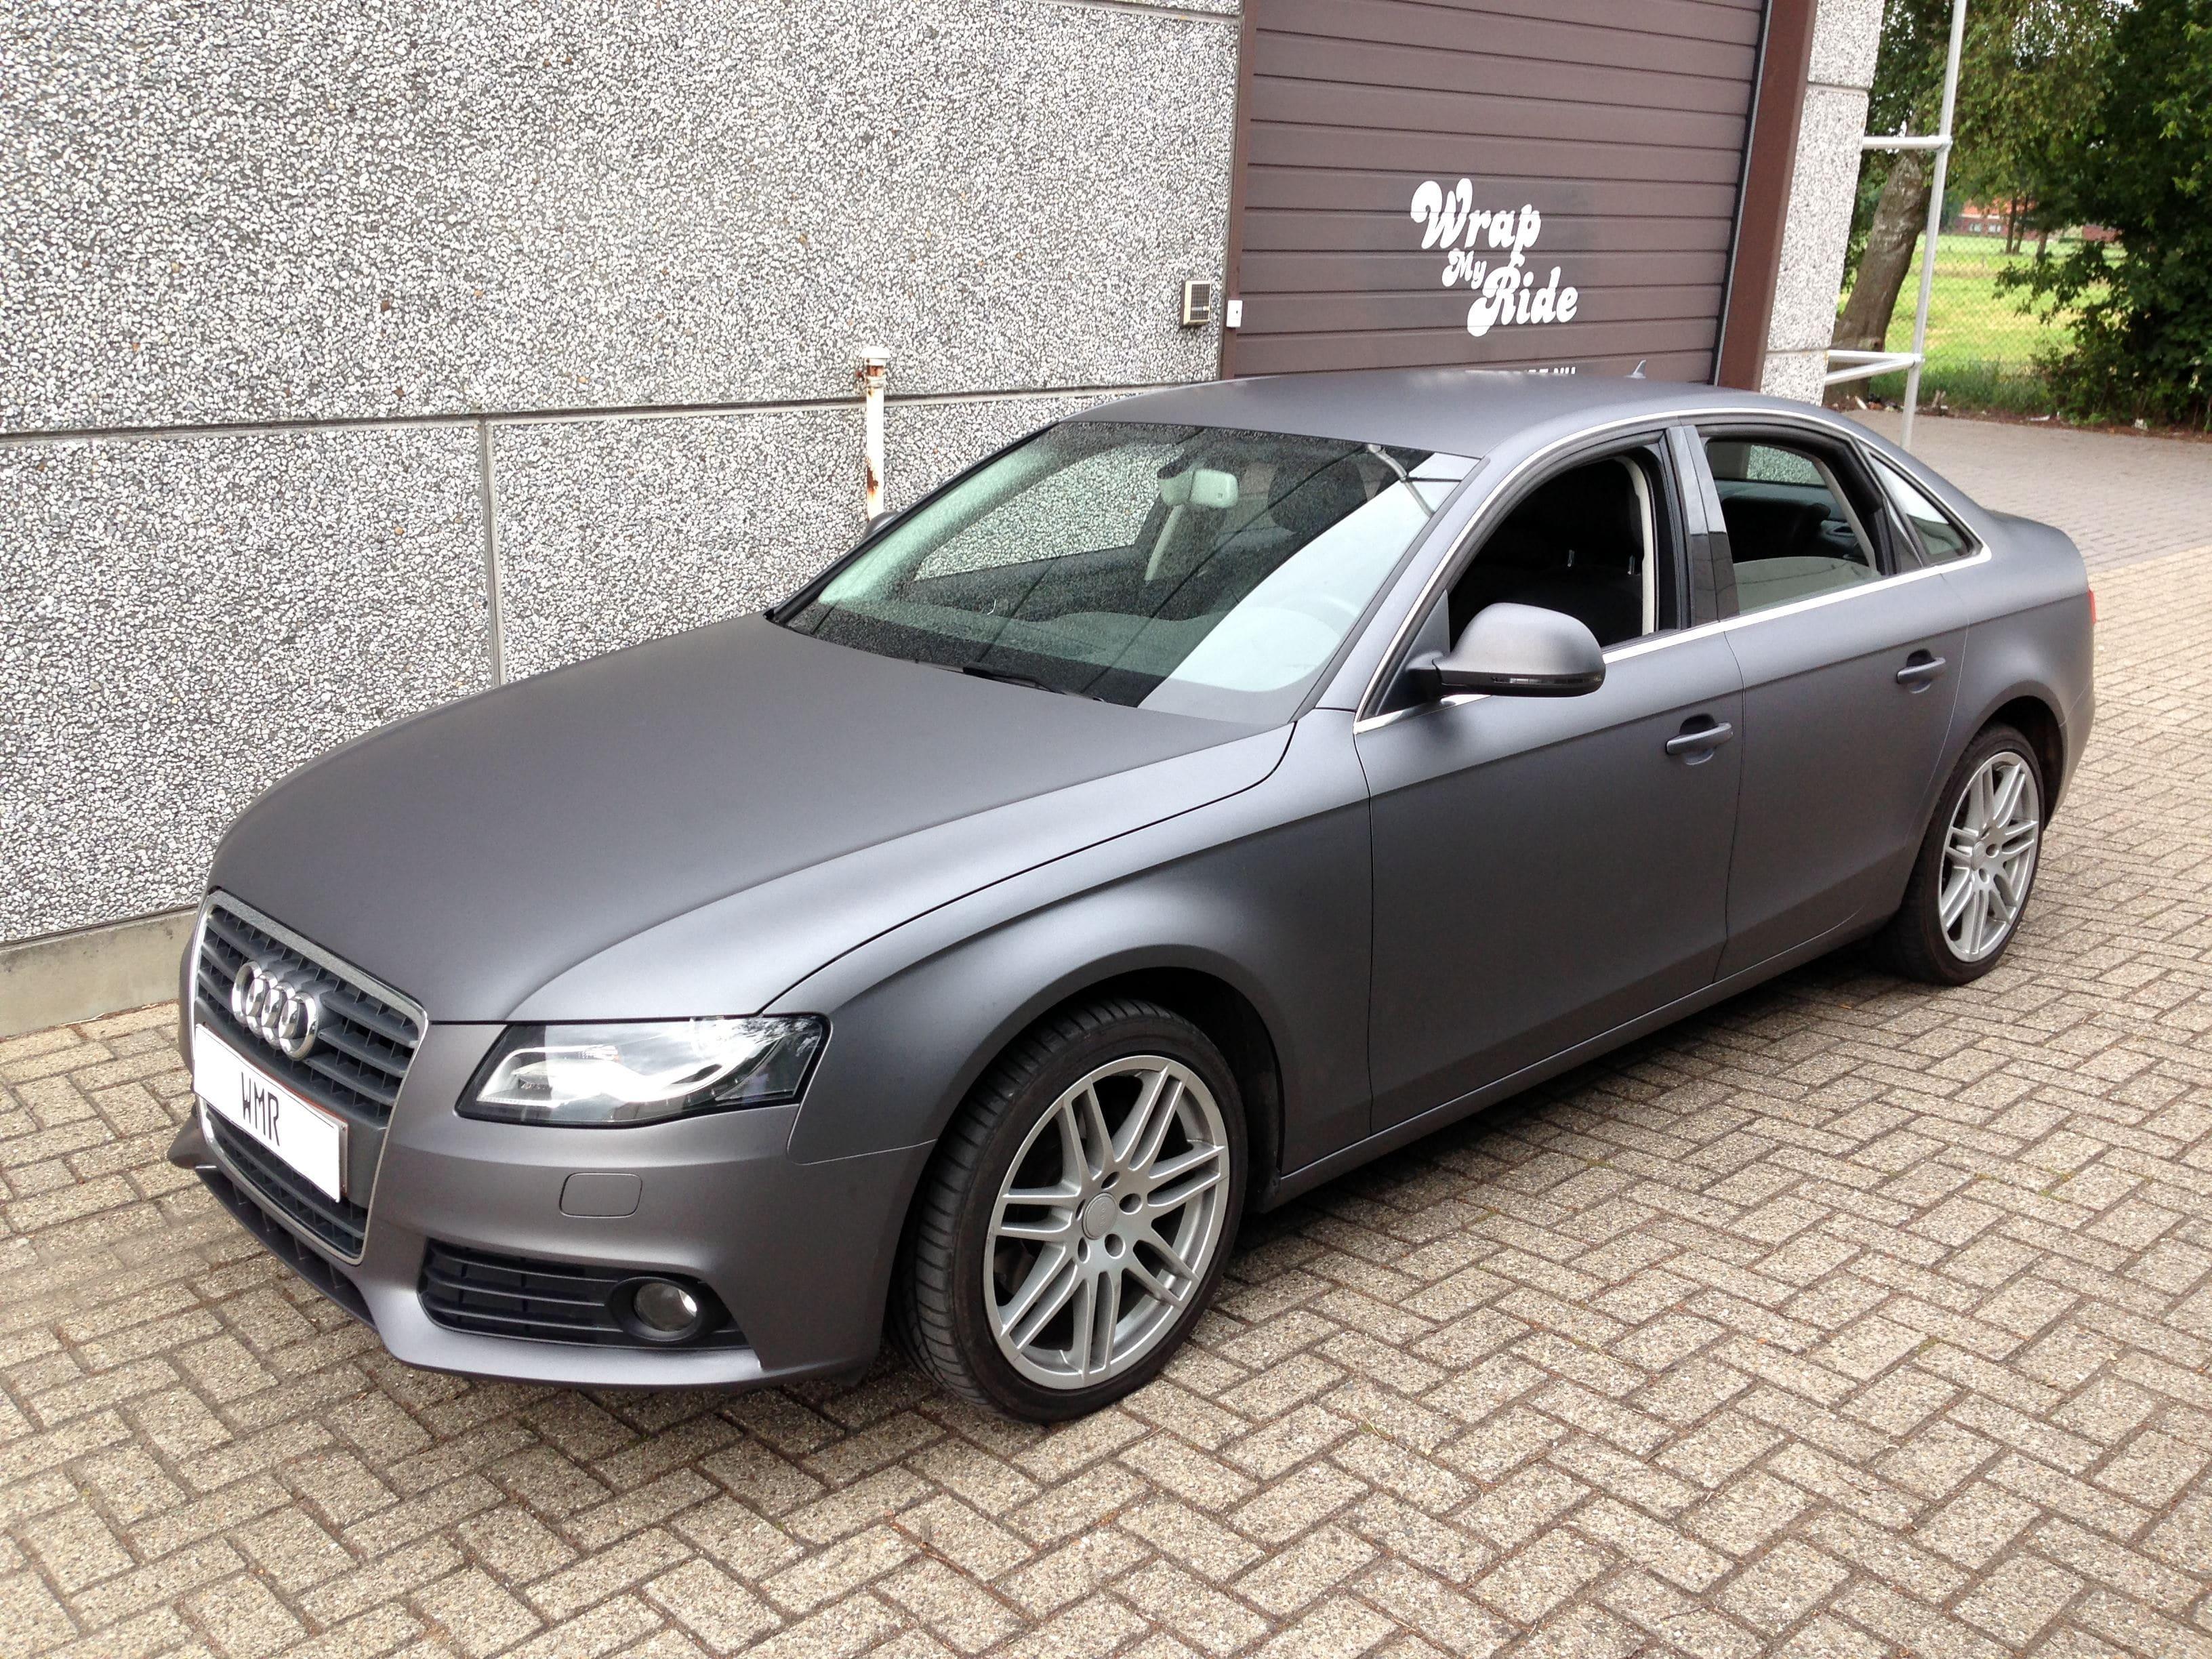 Audi A4 B6 met Gunpowder Wrap, Carwrapping door Wrapmyride.nu Foto-nr:4510, ©2021